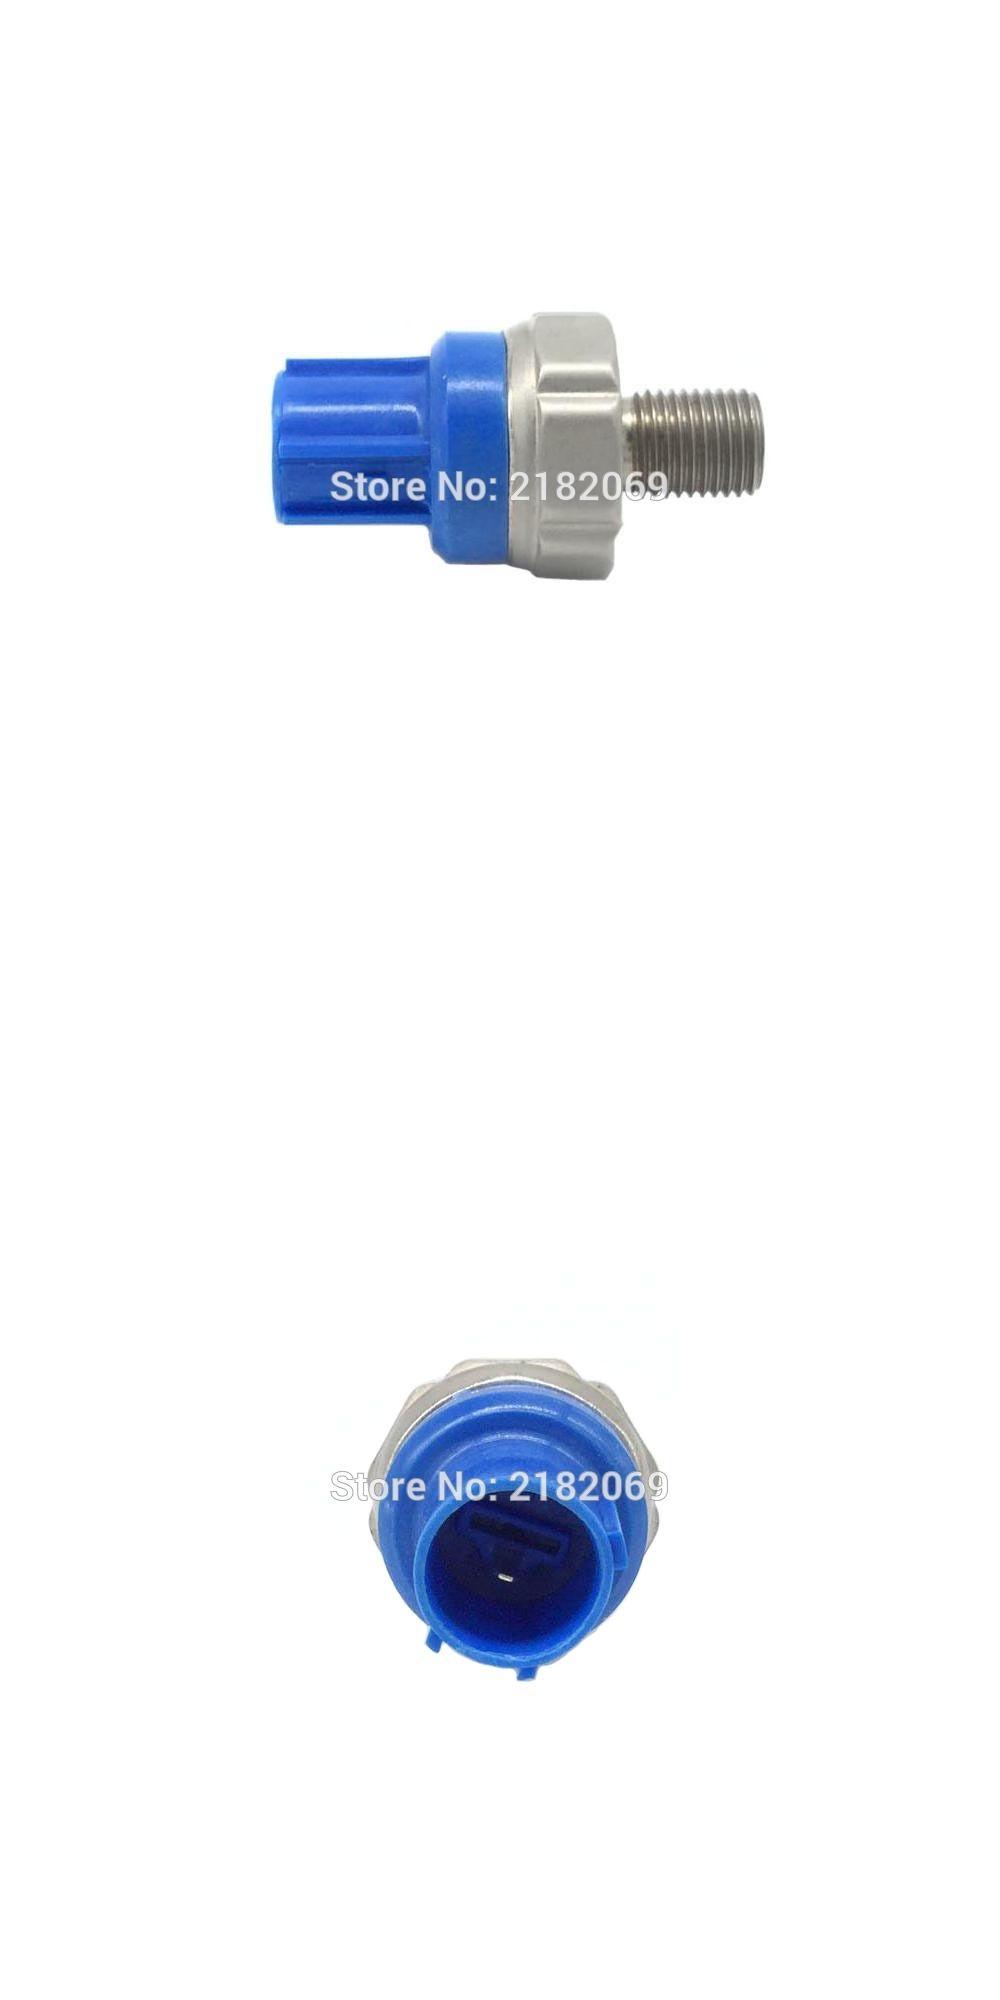 Knock Sensor For 1996 2004 Honda Civic 16l 4cyl Acura Rl 35l Location